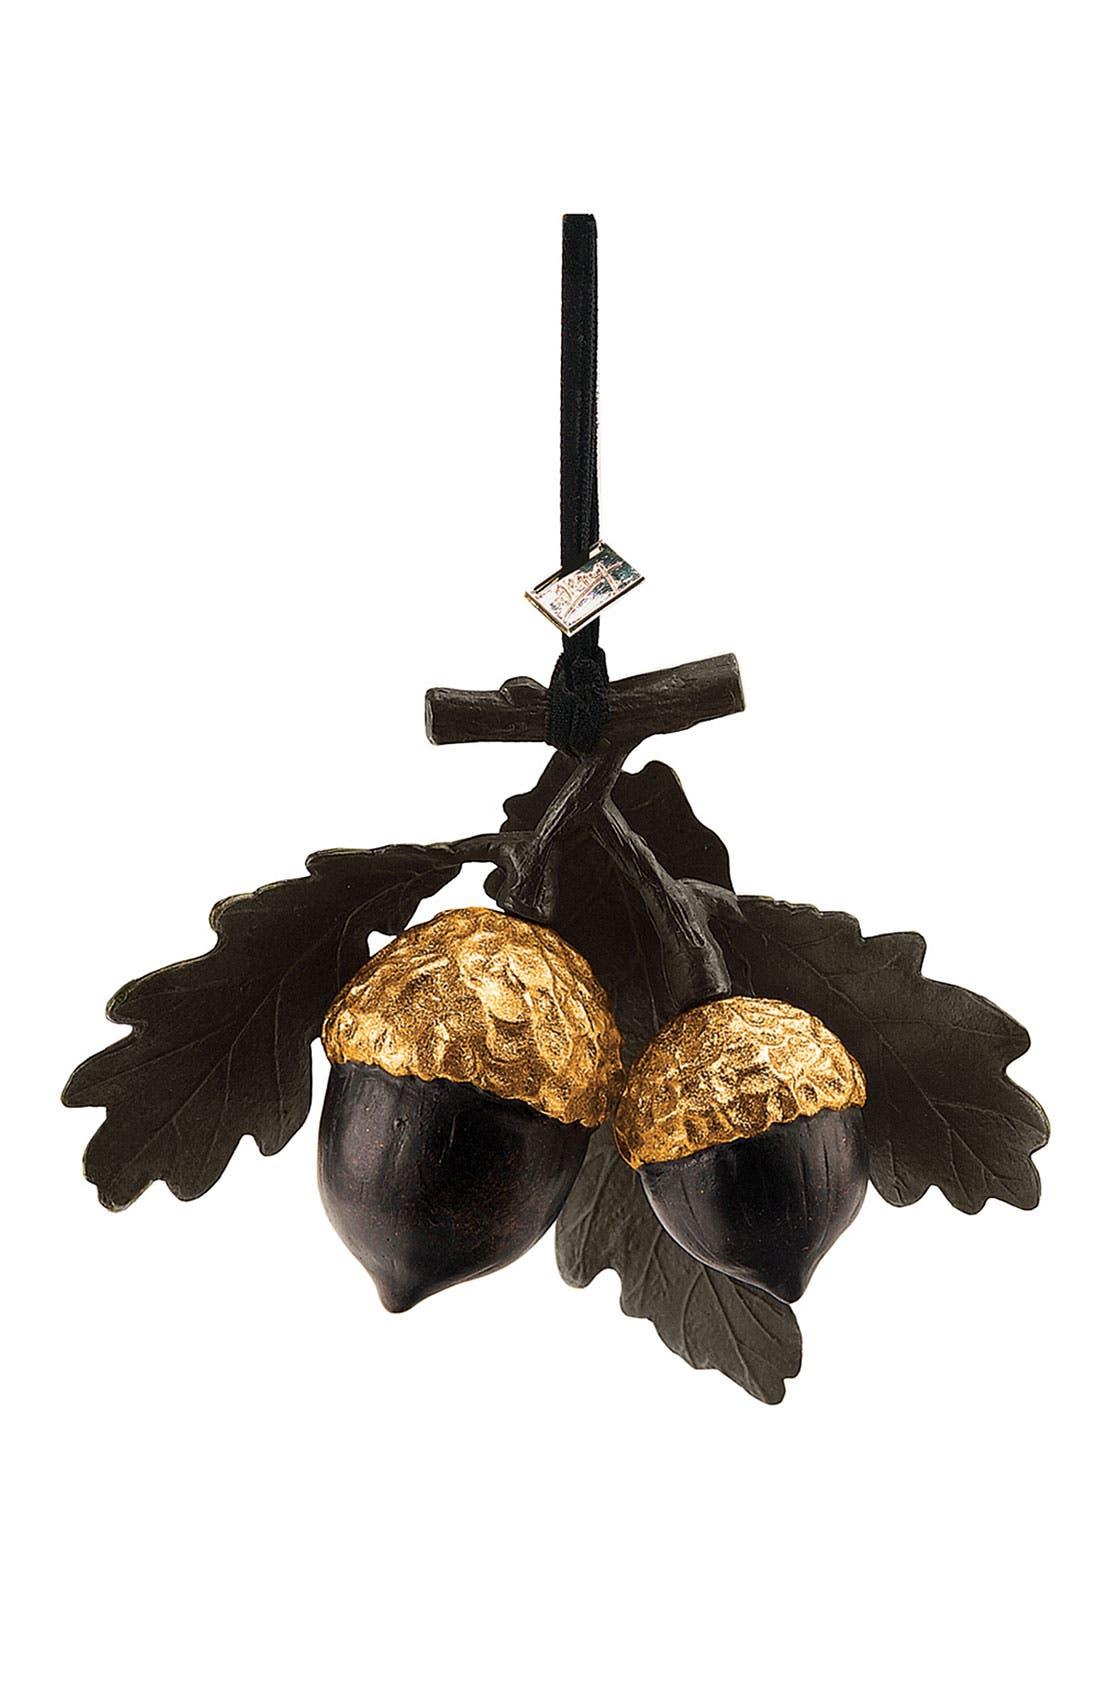 Alternate Image 1 Selected - Michael Aram Acorn Ornament